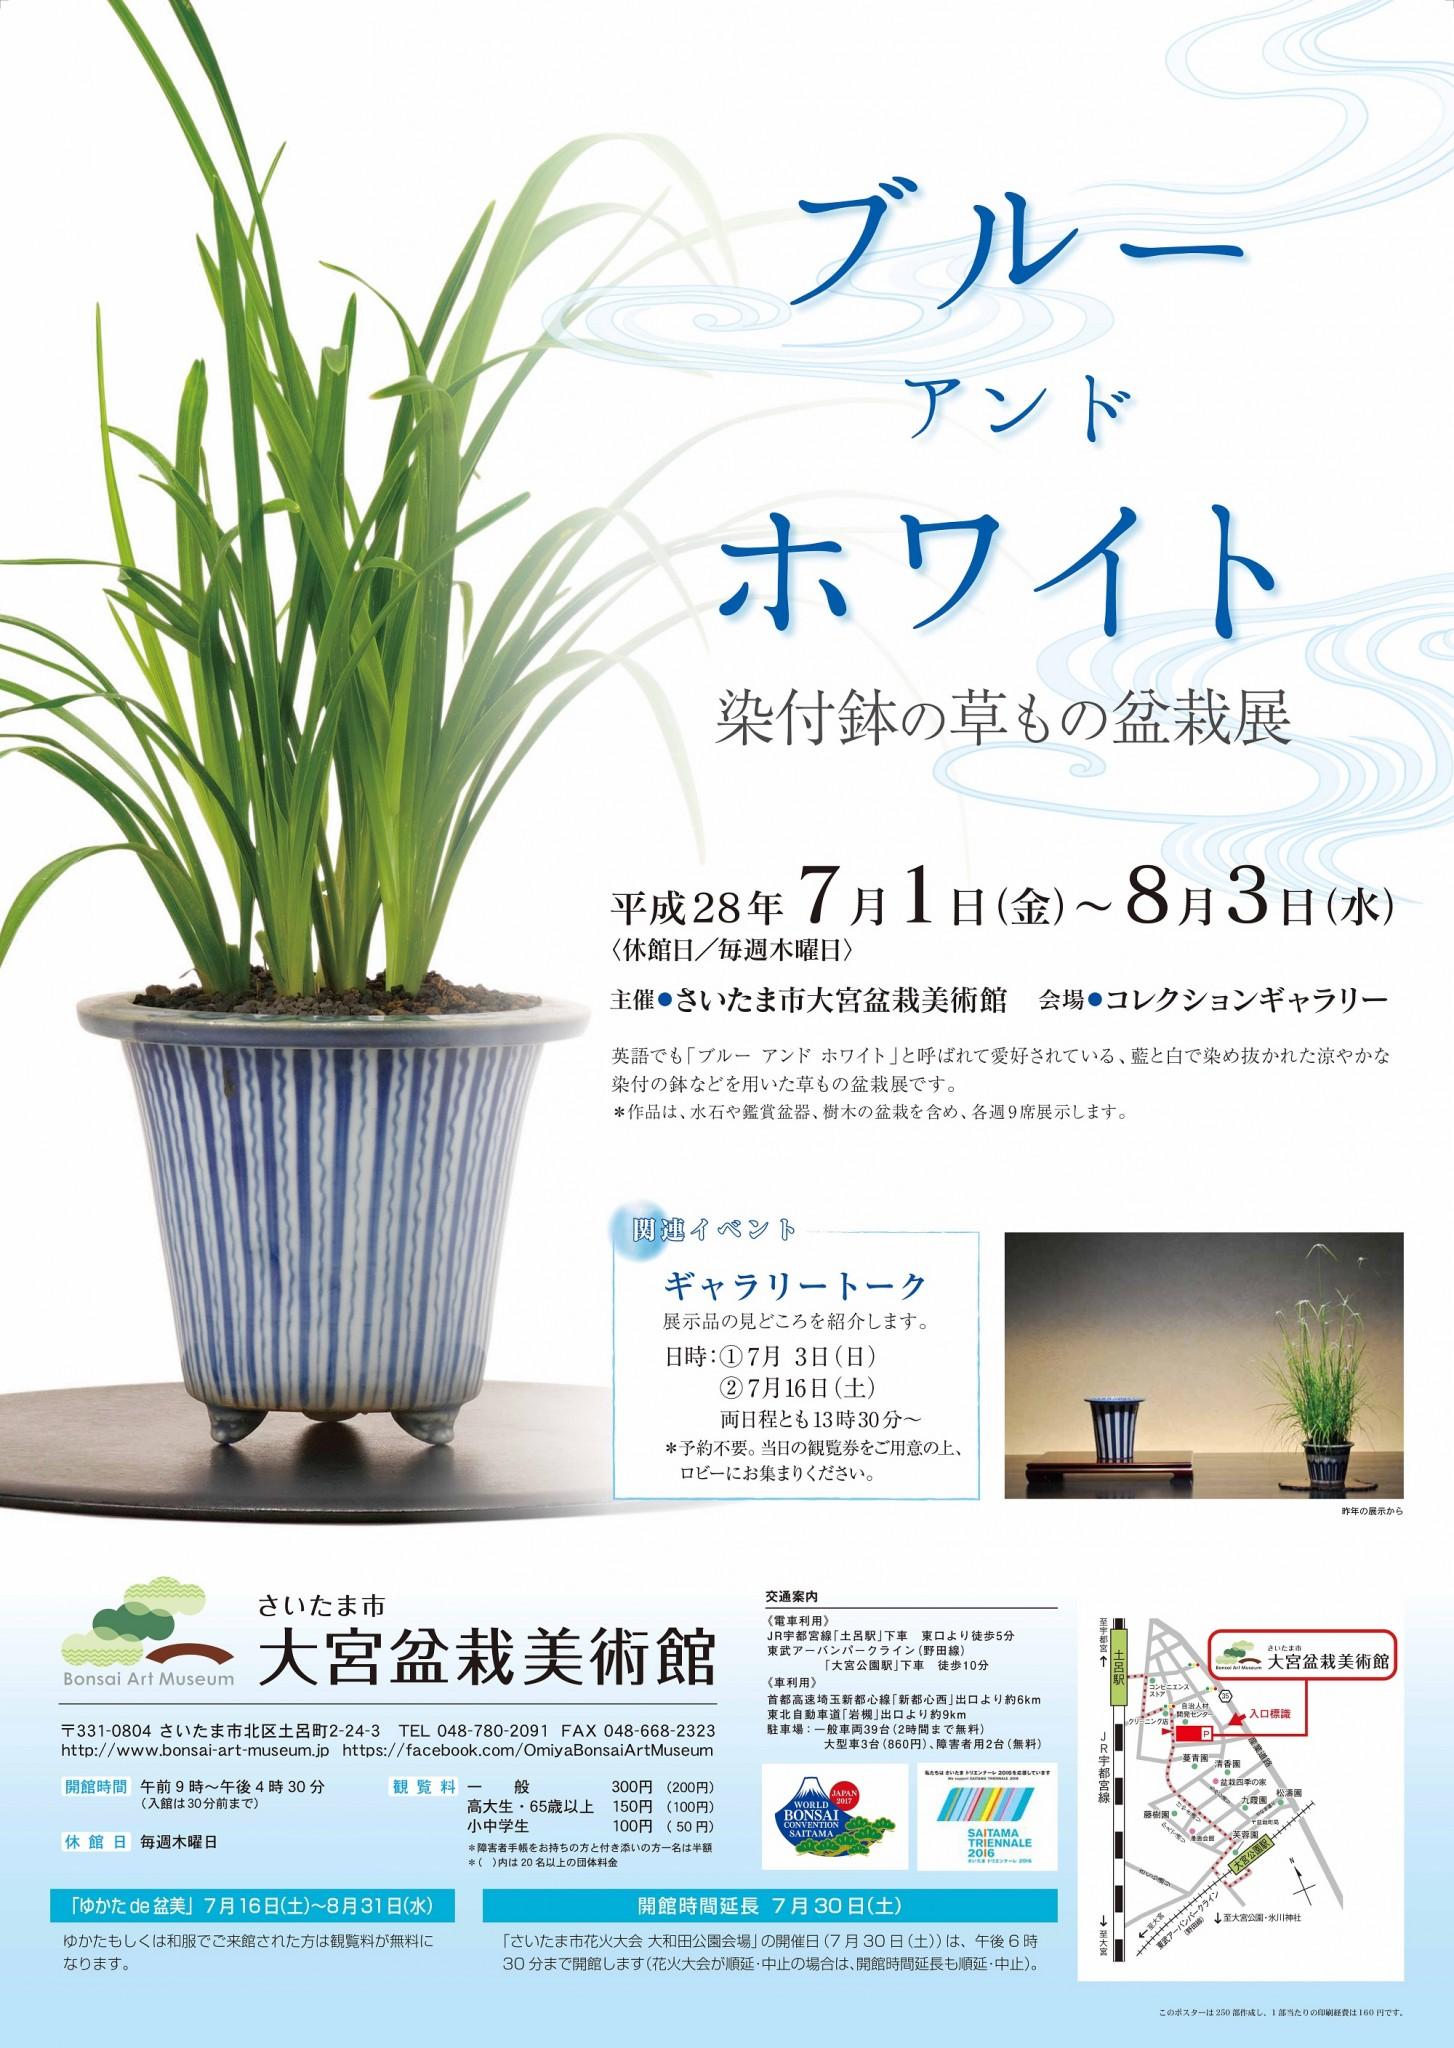 Blue and White―Kusamono (Grass) Bonsai and Porcelain Pot